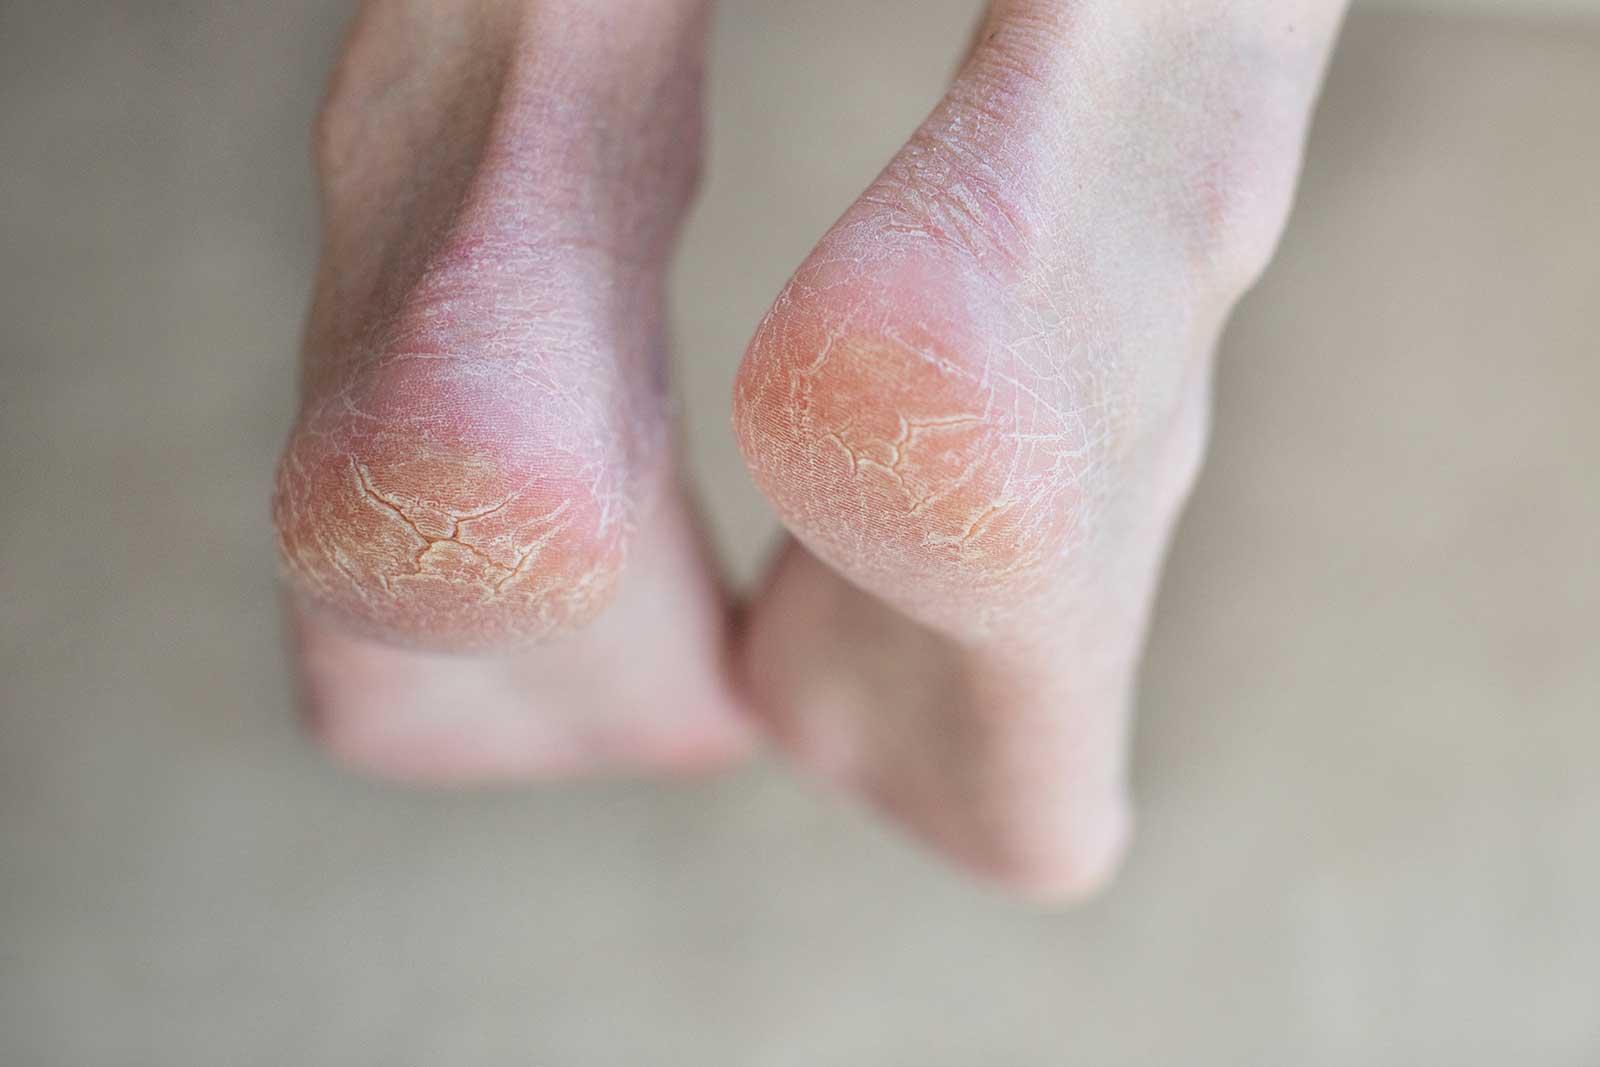 Hard Skin, Corns and Calluses